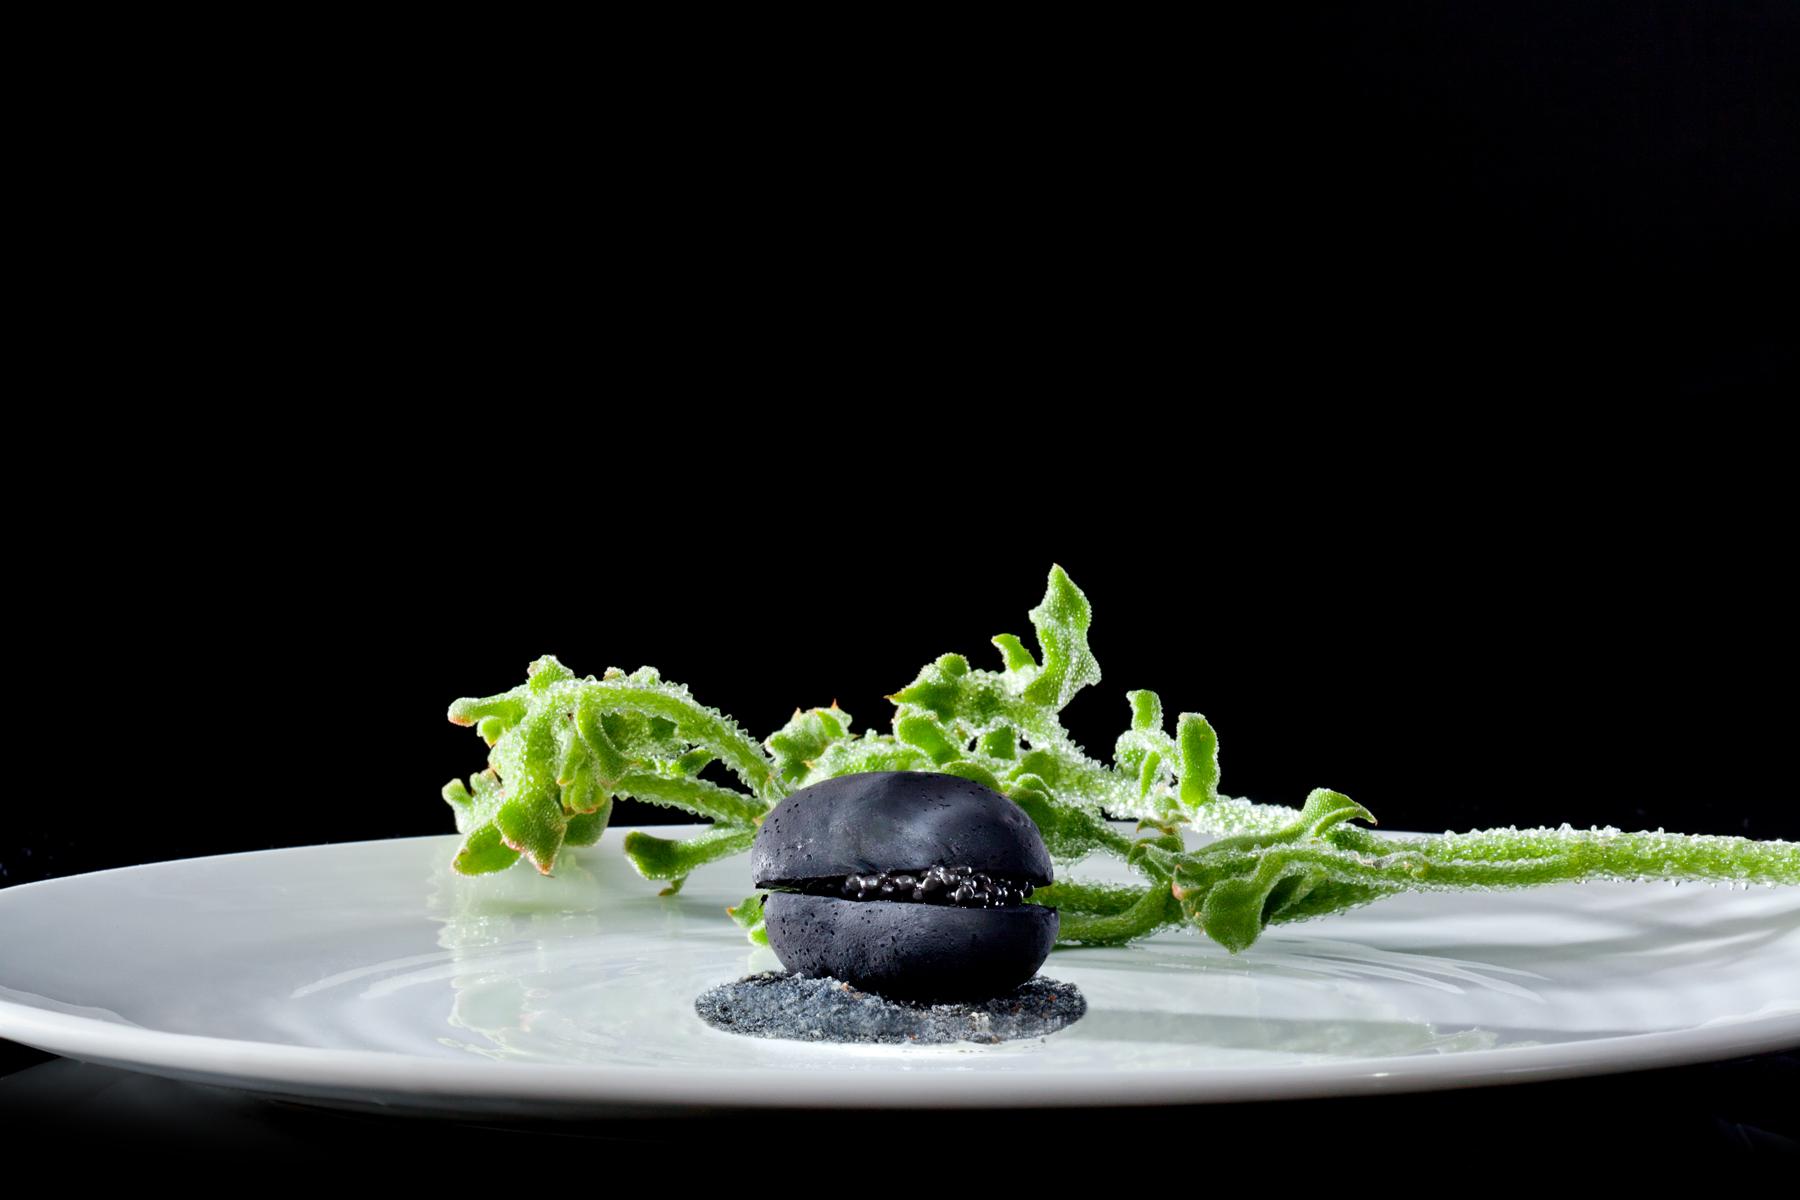 WHISK_2014_Degustation Menu Voyage 4.1 - AUSTRIA - Black Potato, Caviar & Sour Cream 02